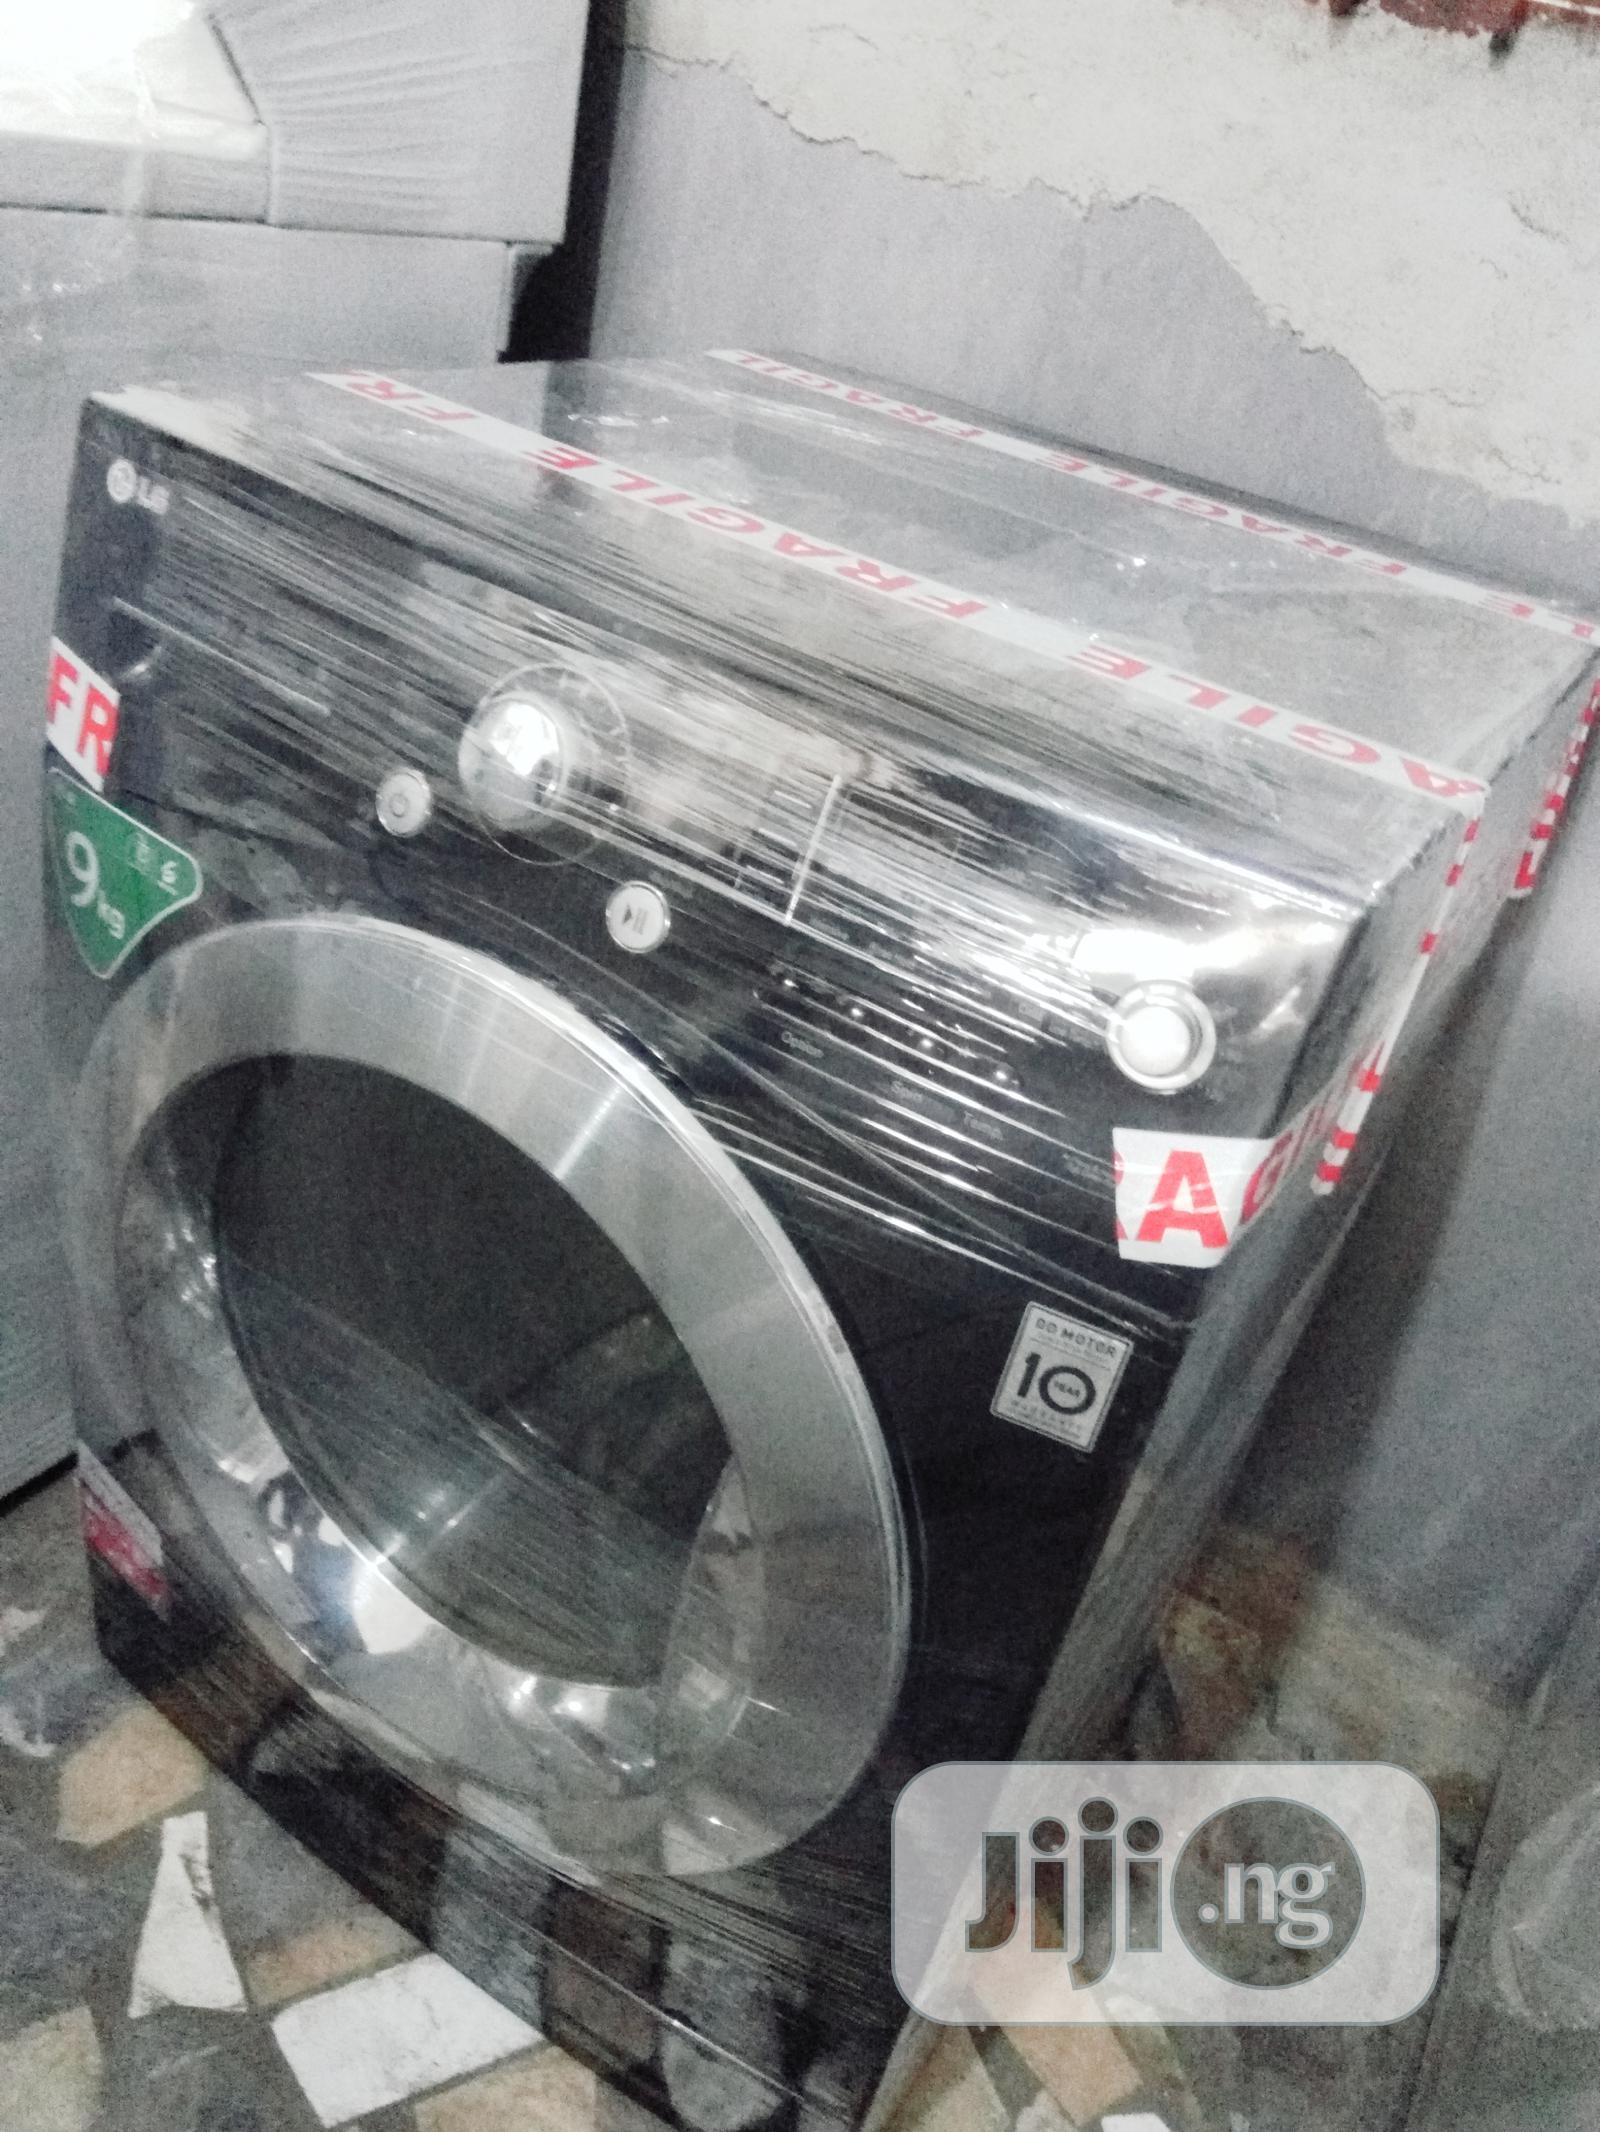 Inverter Drive LG 9kg Washing Machine Washer Dryer